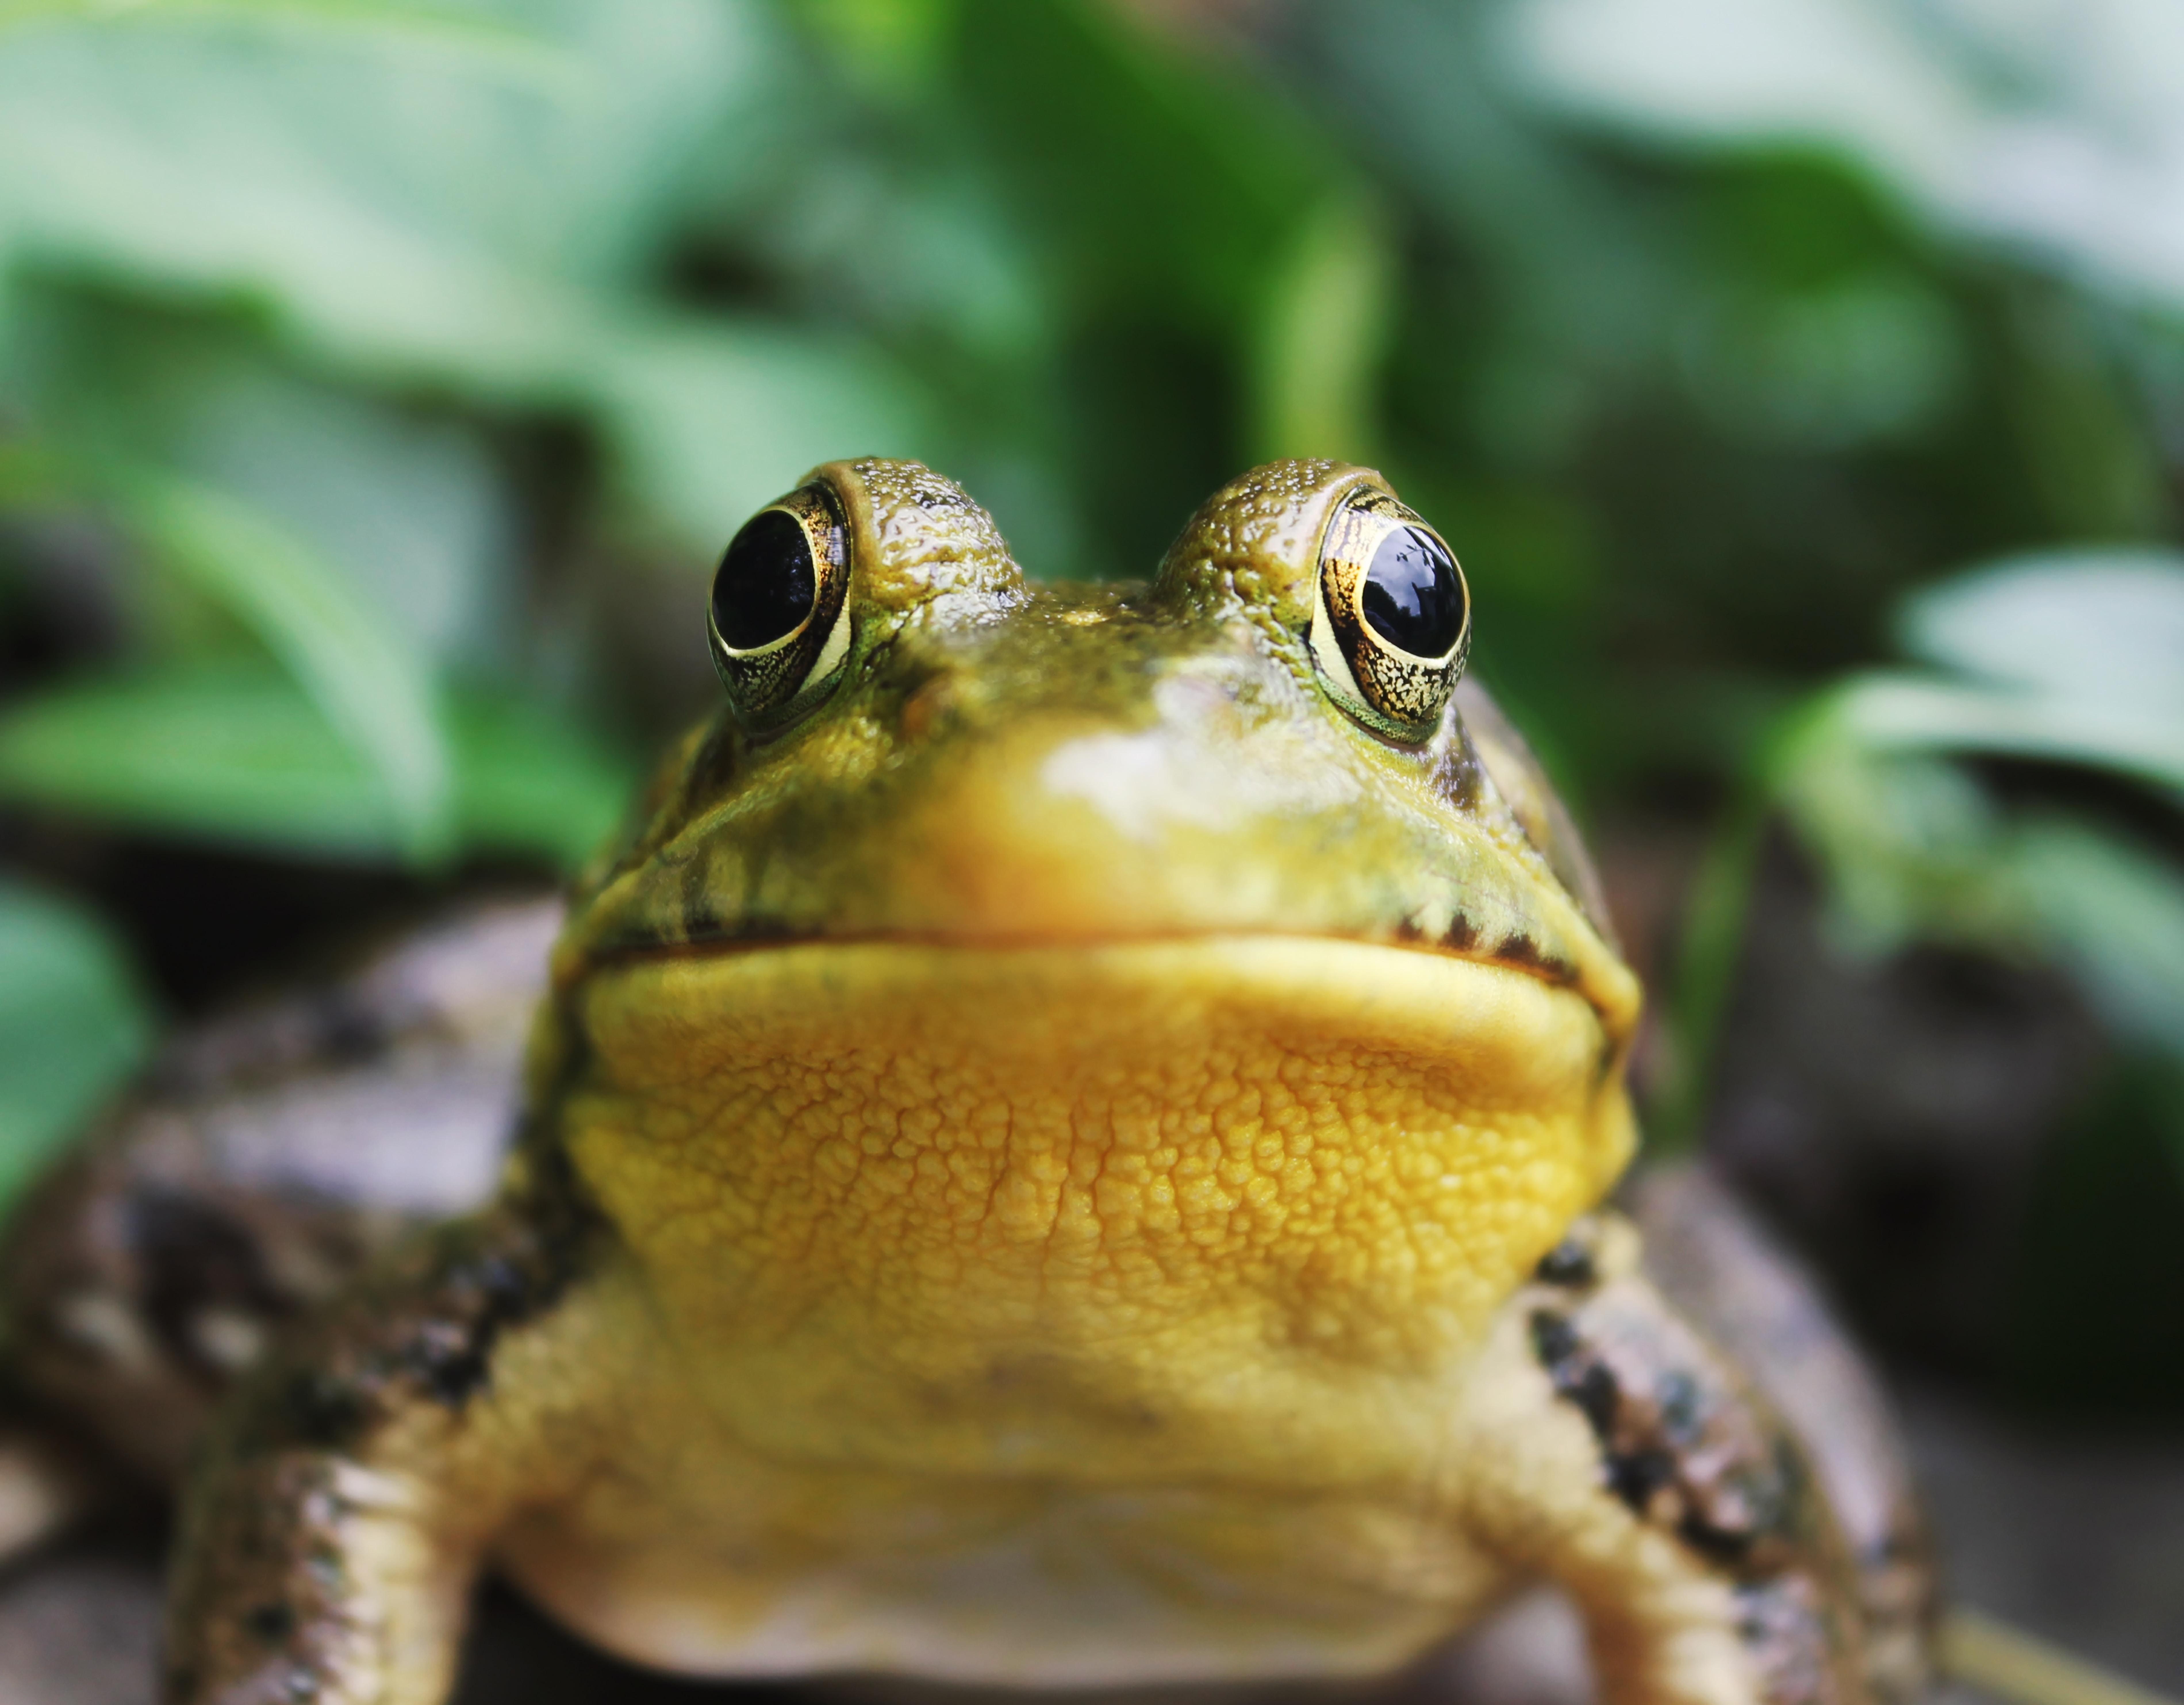 frog  amphibian  toad and tree frog hd photo by jack hamilton   jacc  on unsplash